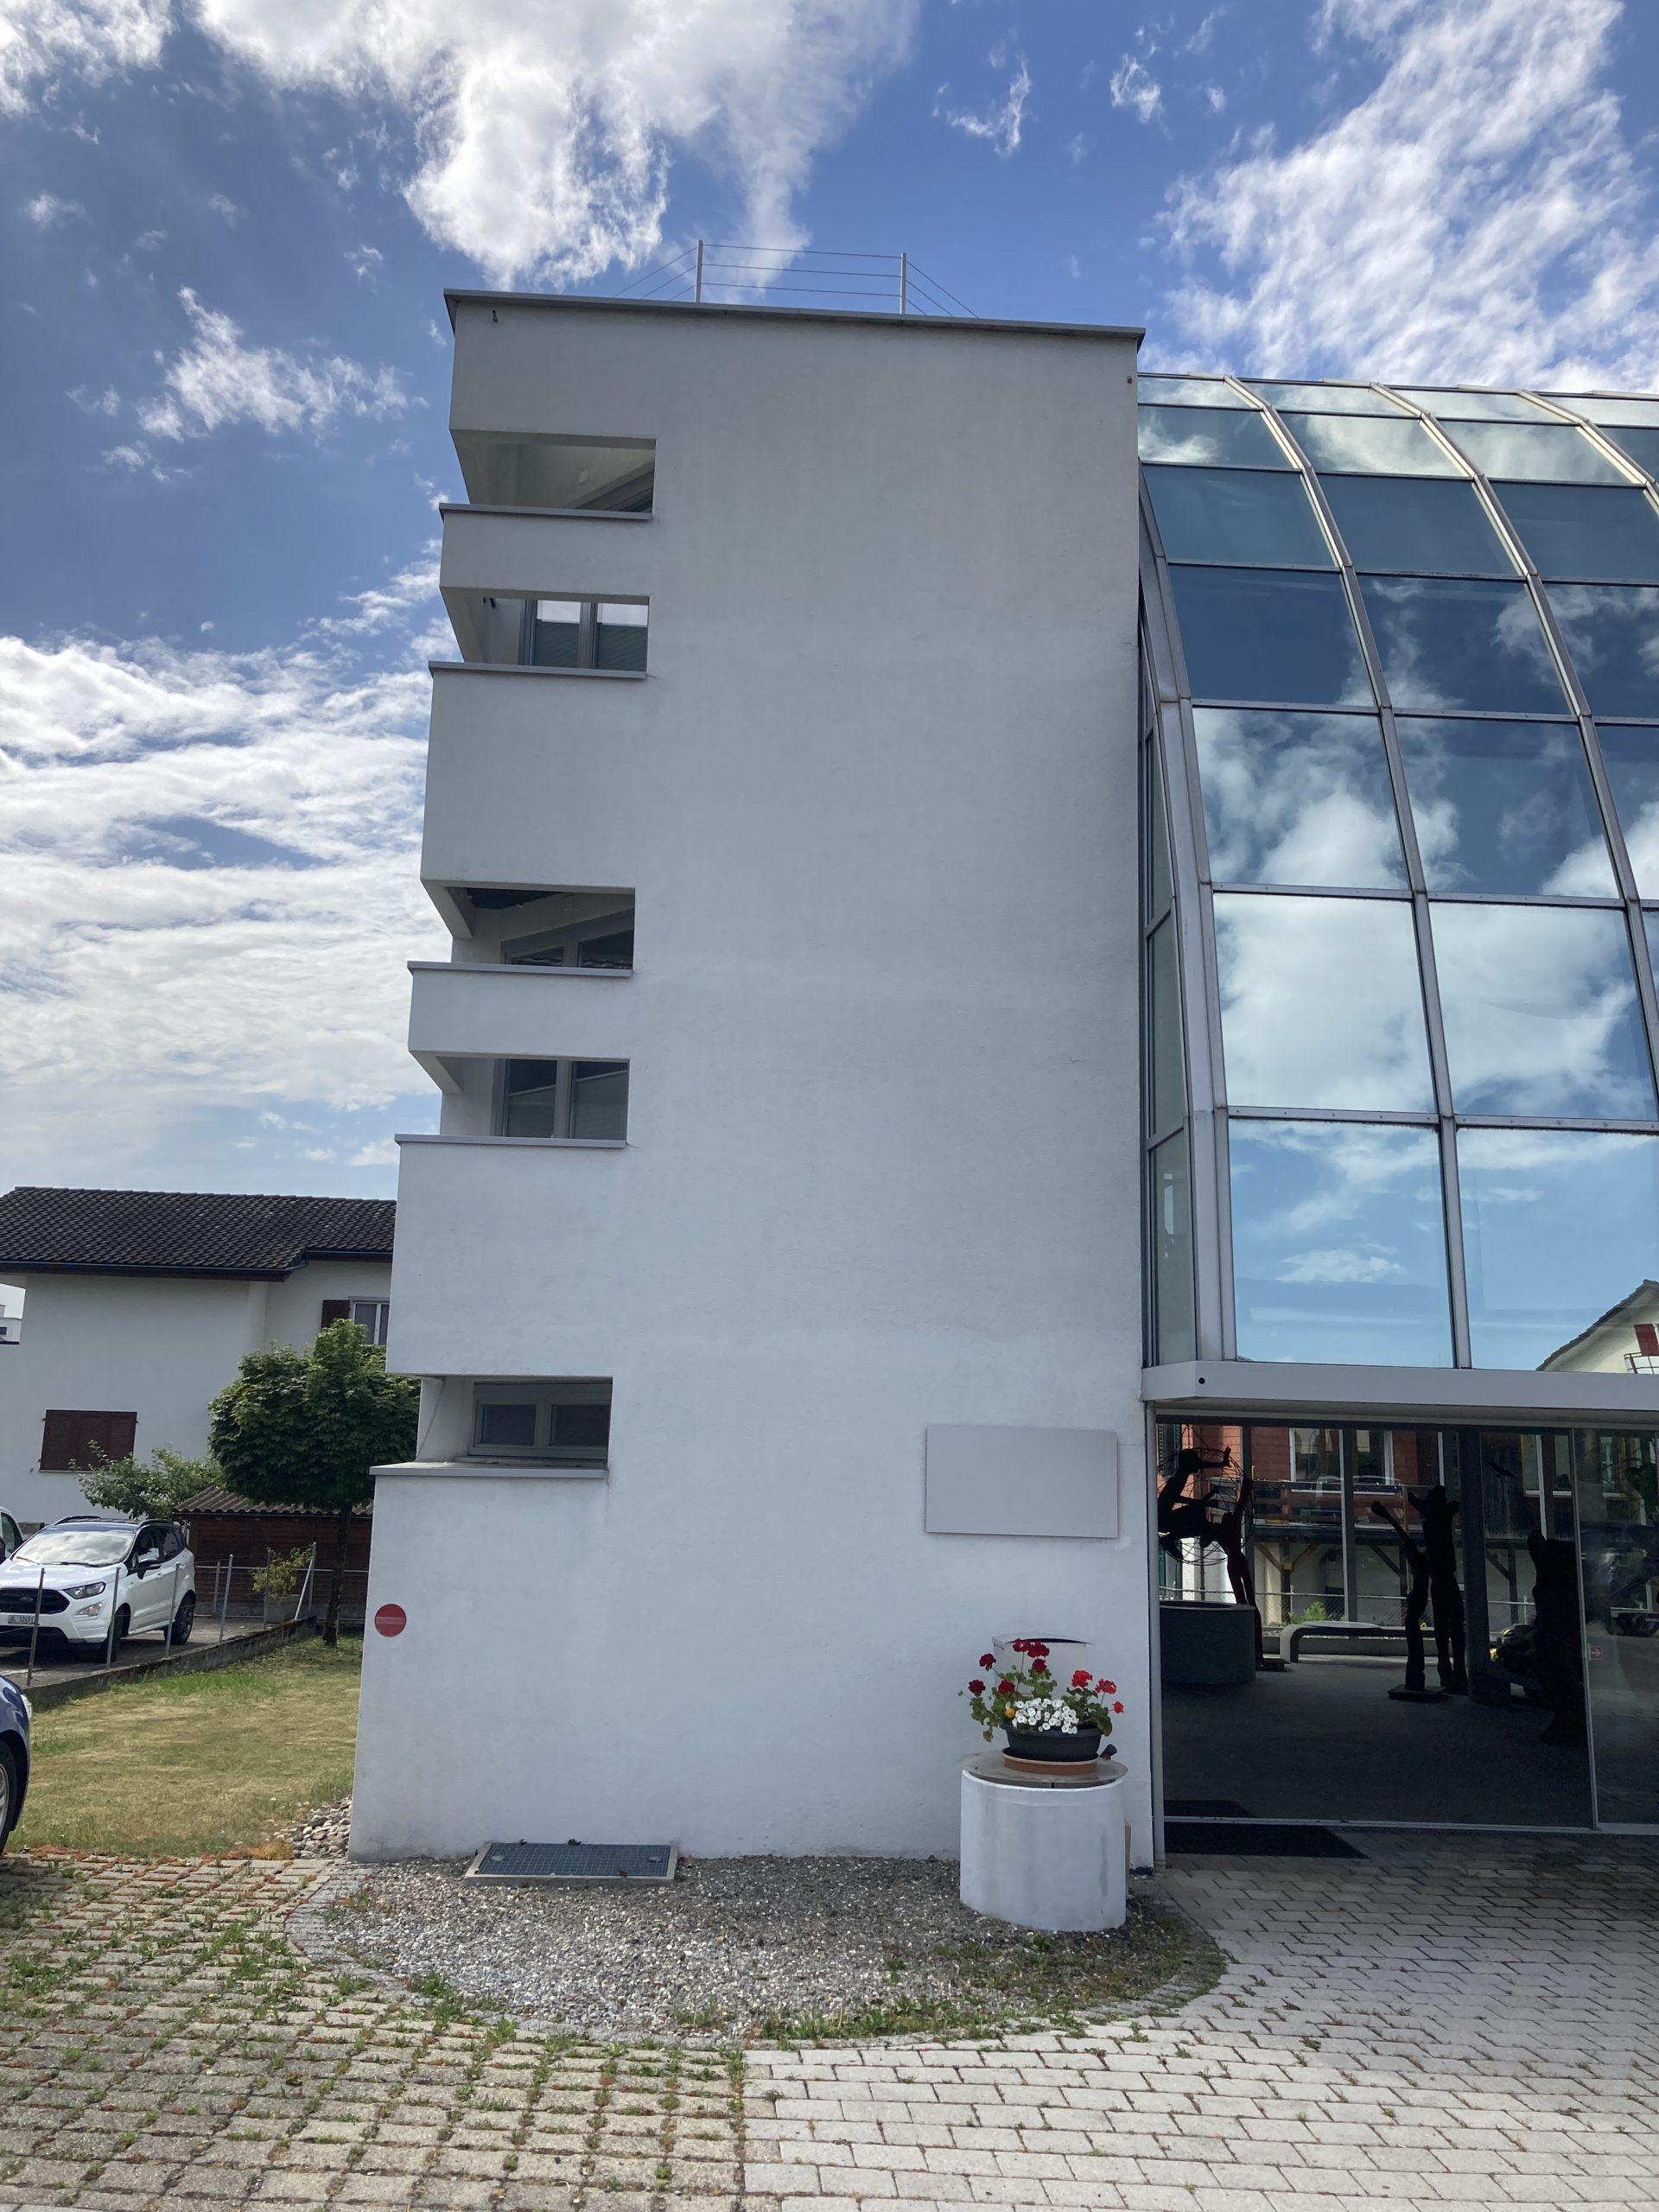 https://www.koster-gs.ch/wp-content/uploads/2021/07/Reichmuth-1-Fassade-Ost-nachher-scaled.jpg